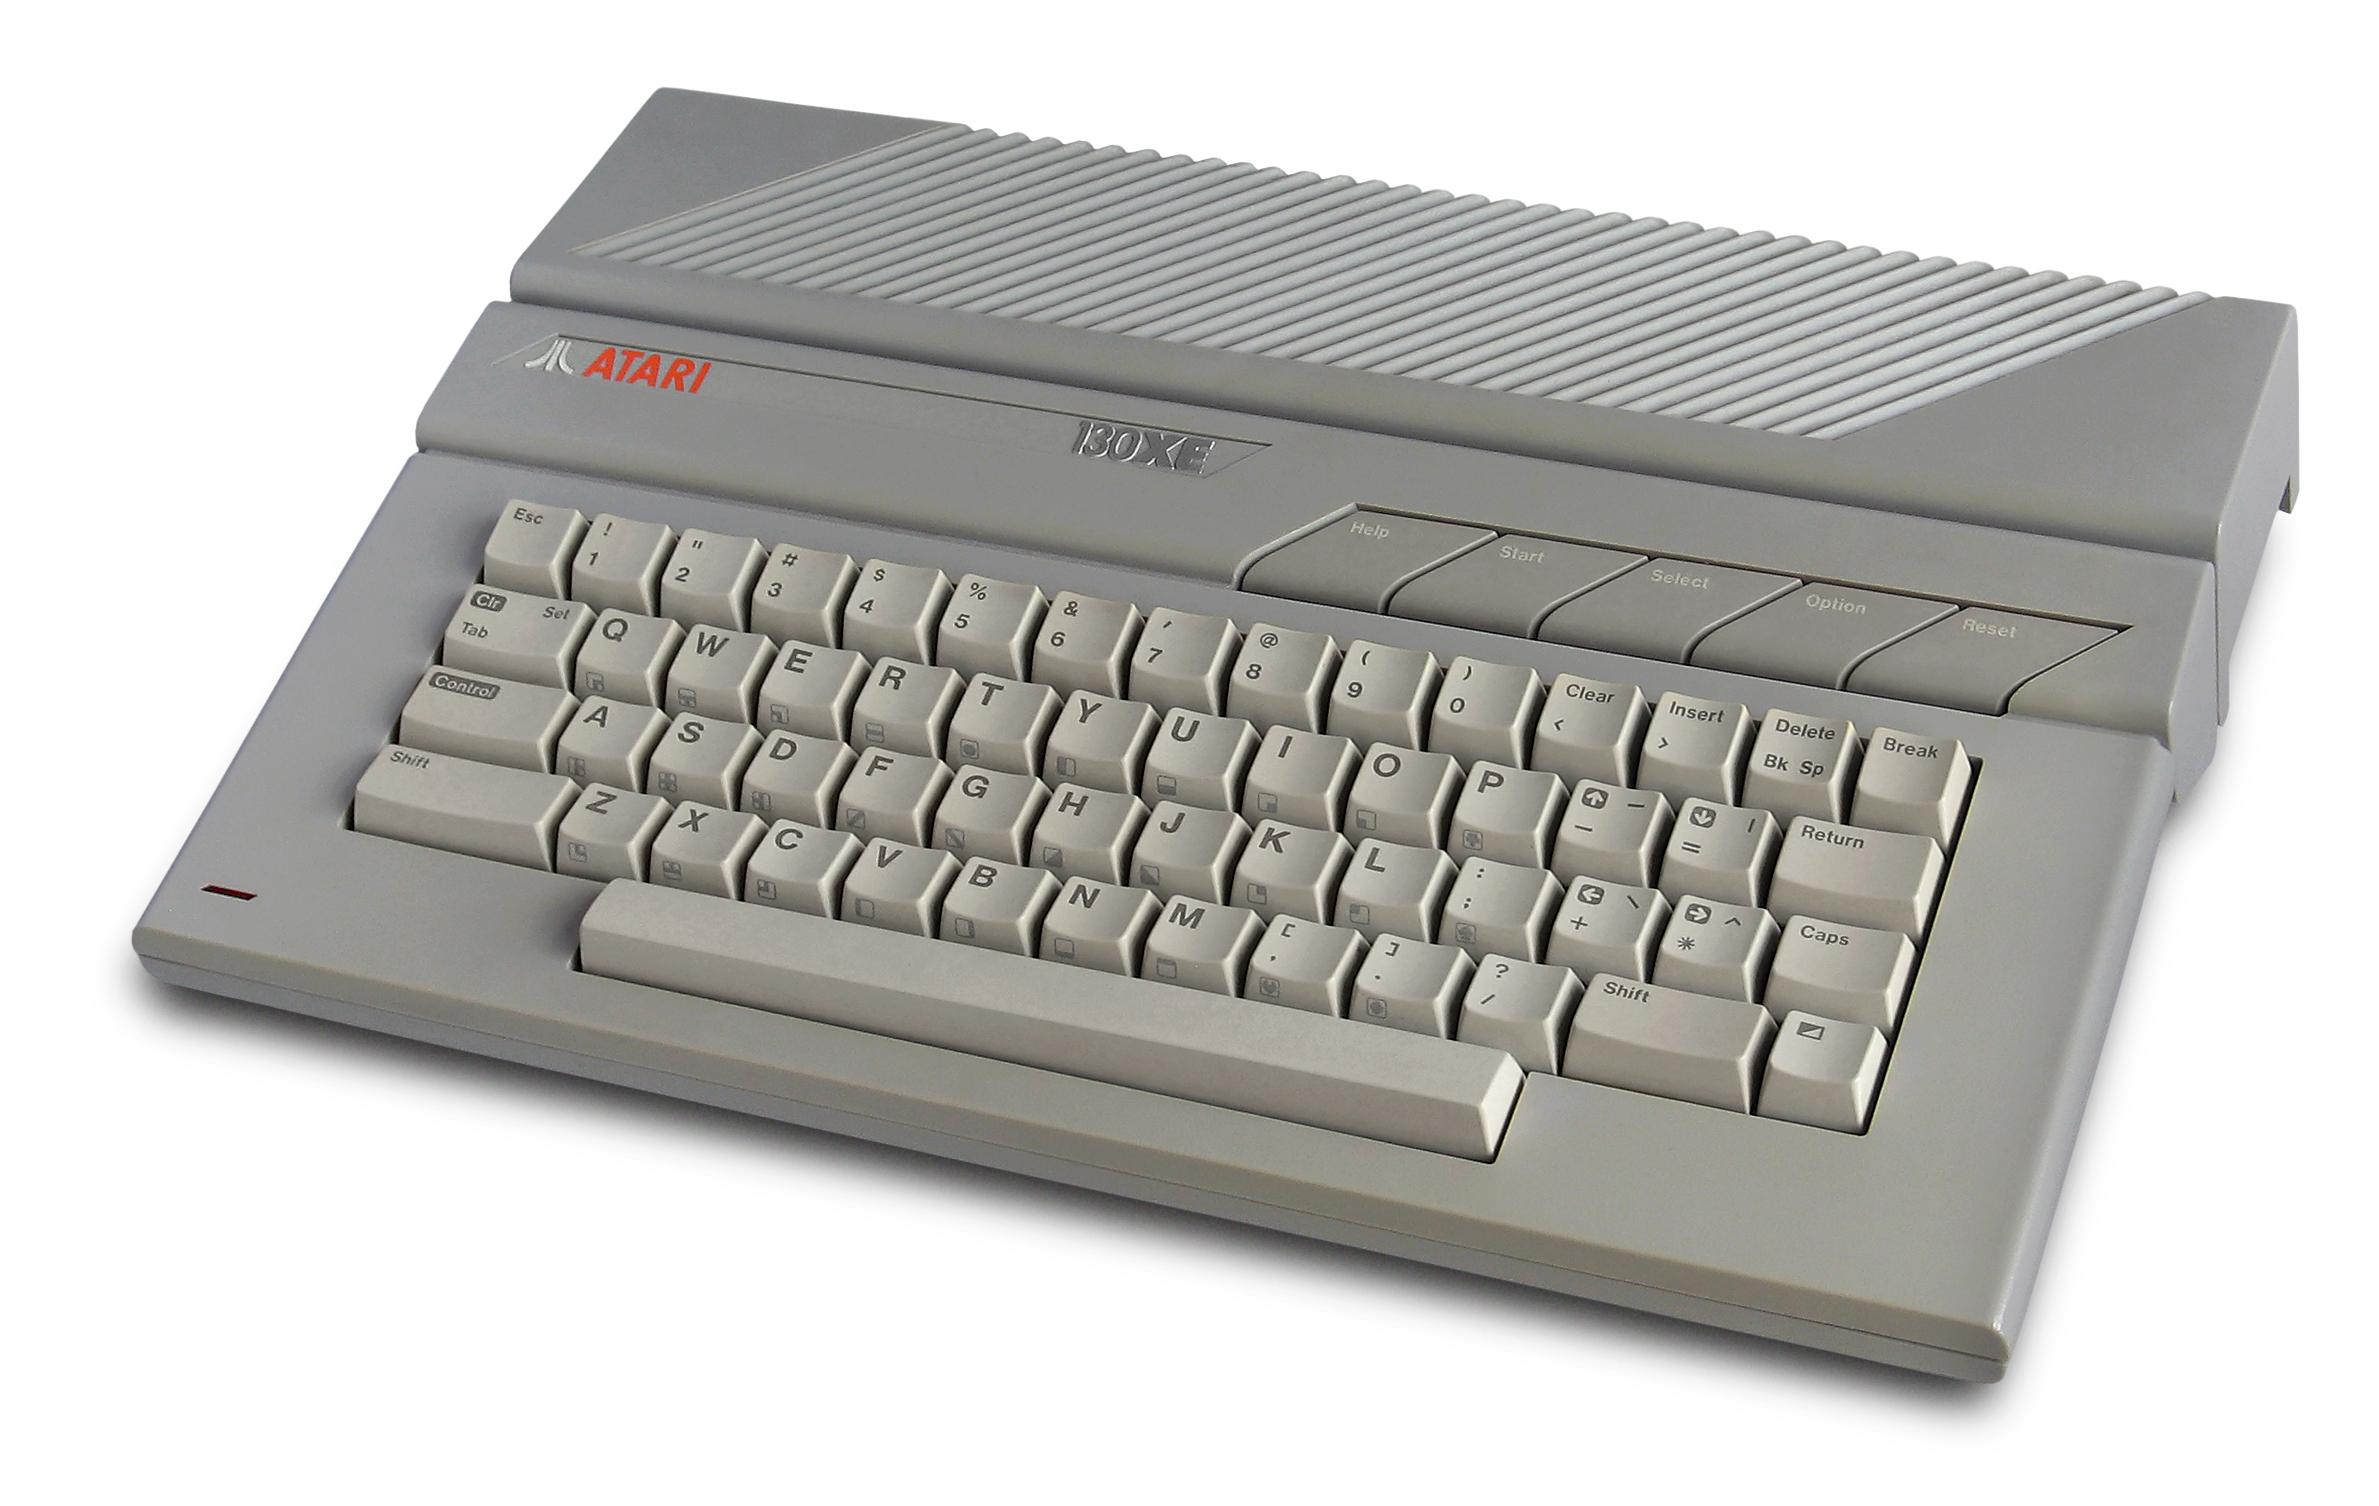 Atari_130XE_Reshot.jpg